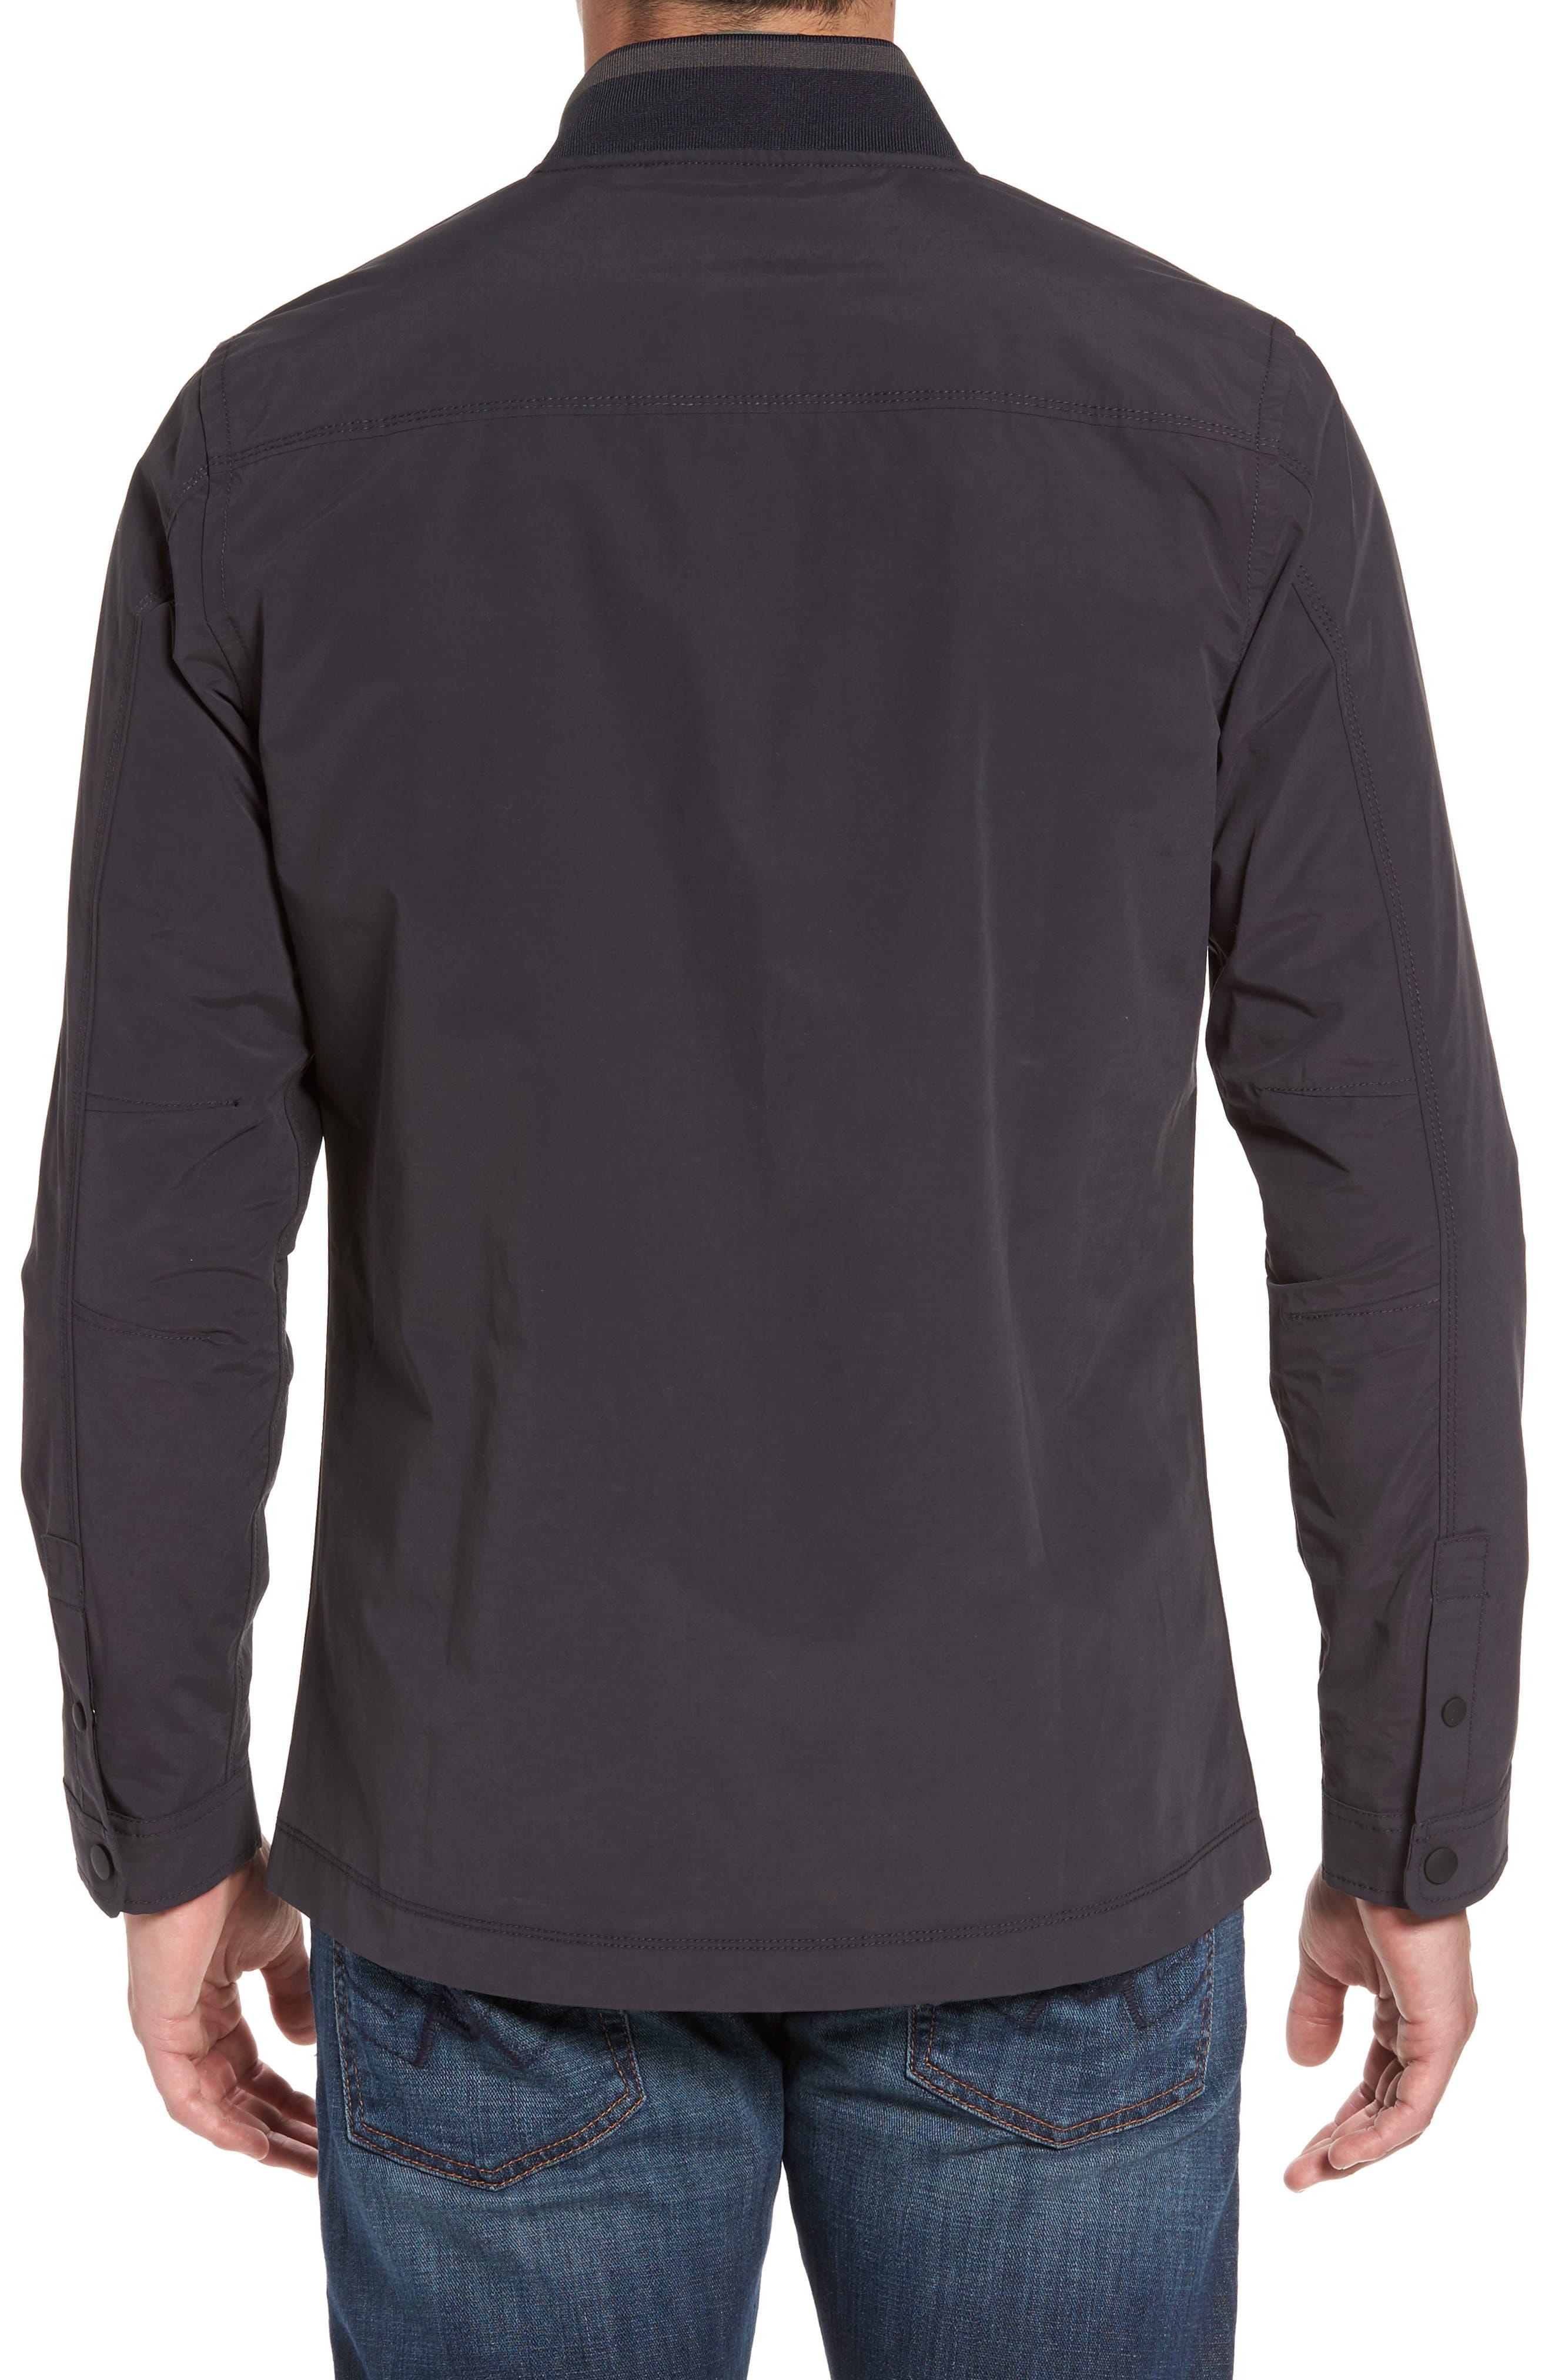 Jarvis Coated Cotton Blend Jacket,                             Alternate thumbnail 2, color,                             412